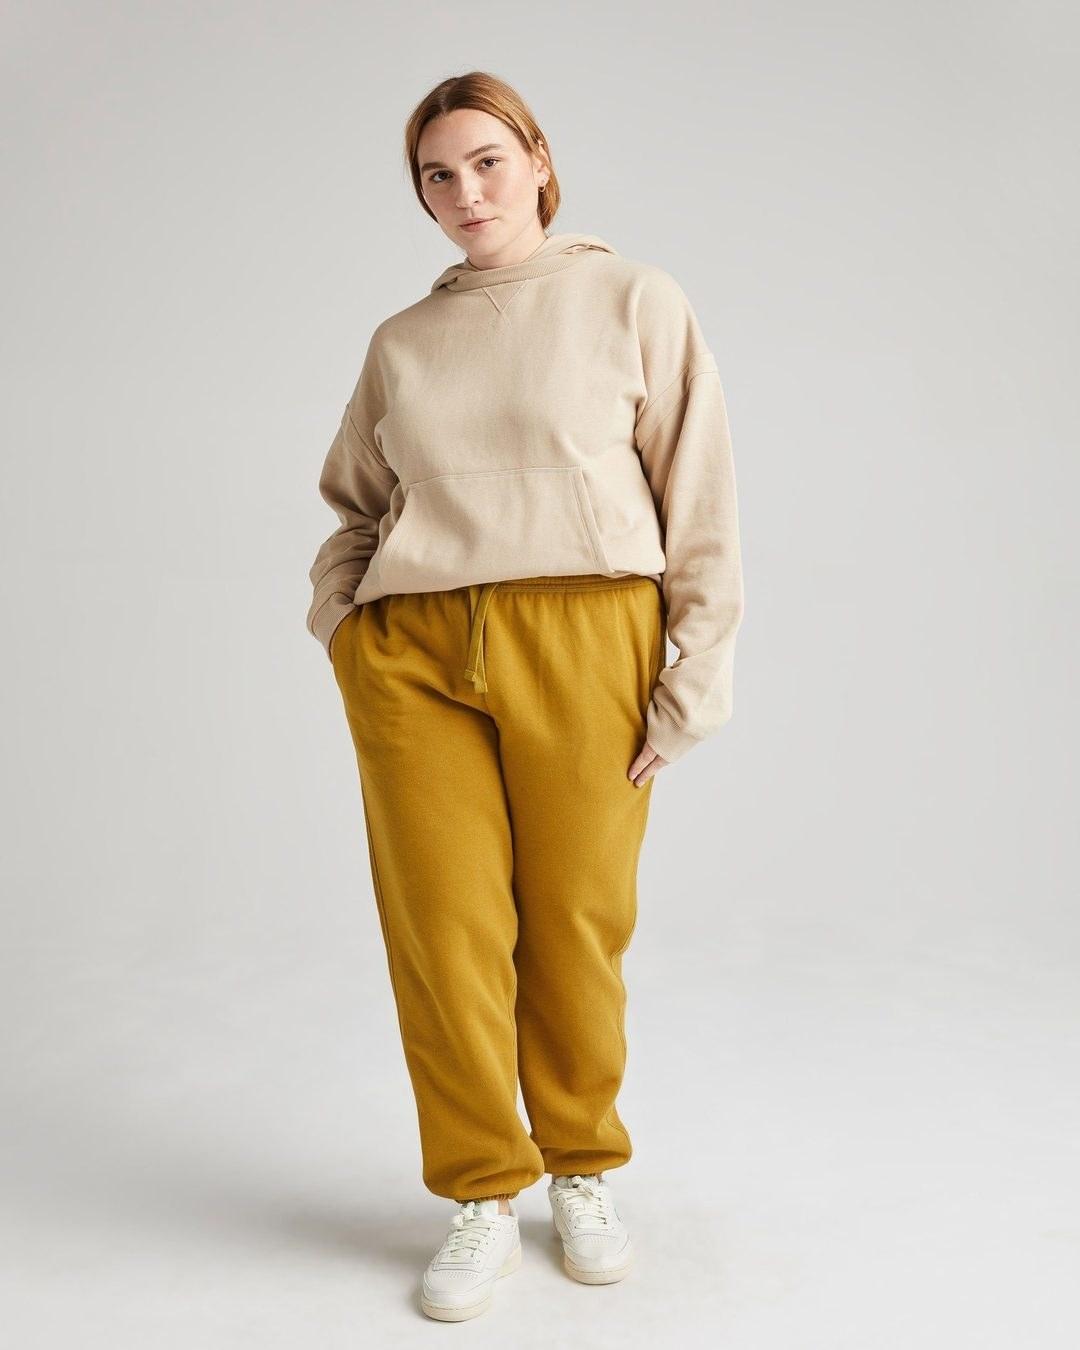 model wearing the golden yellow sweatpants